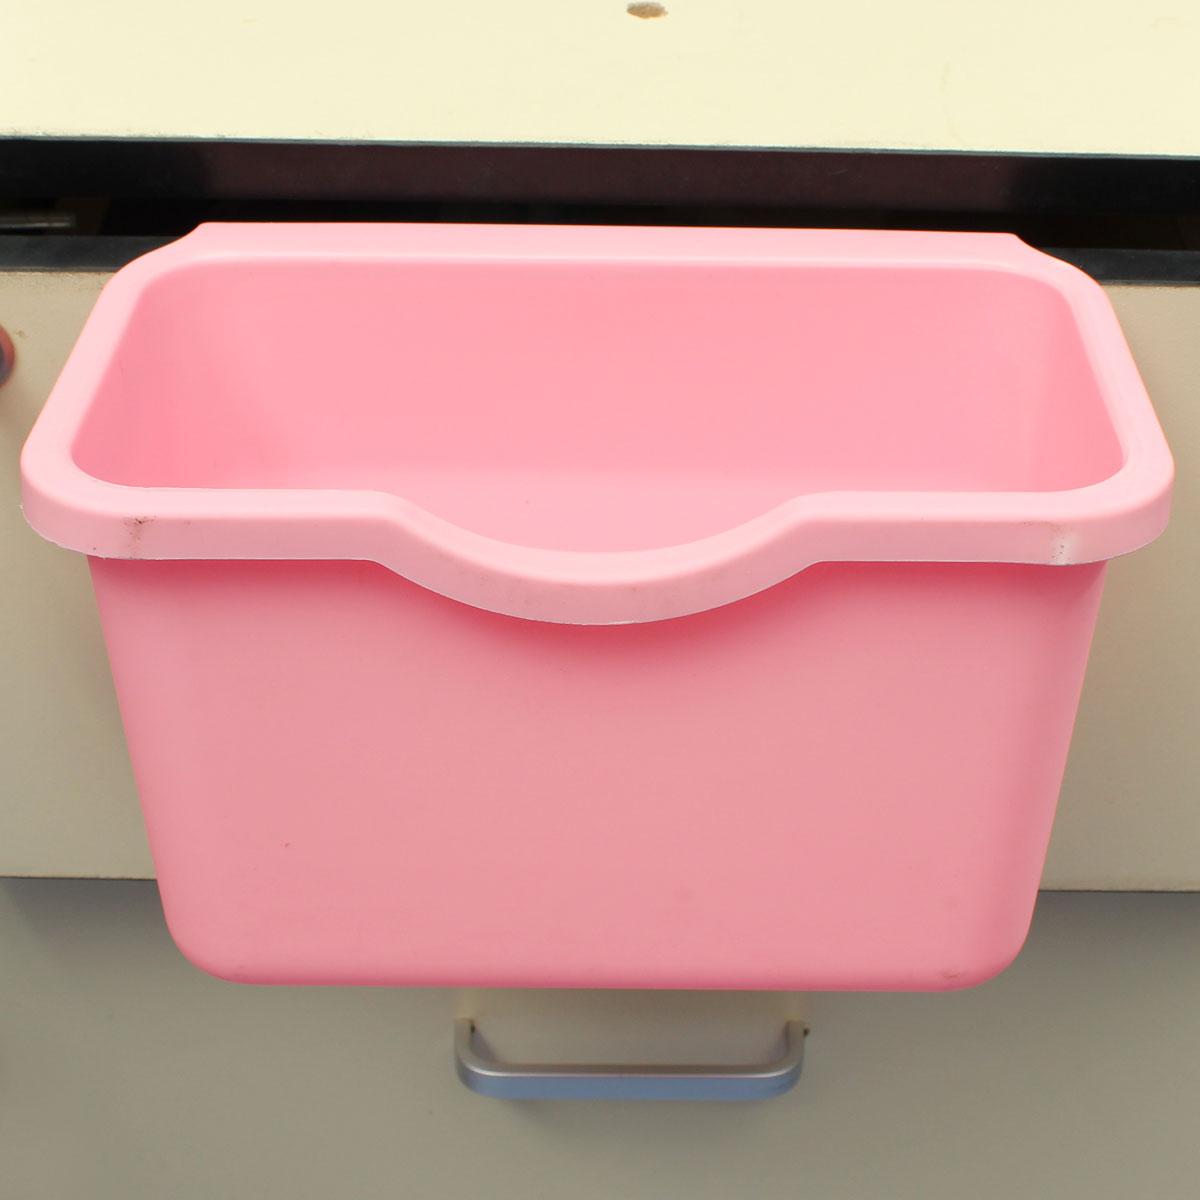 Desktop door kitchen garbage storage box pink lazada ph - Pink kitchen trash can ...